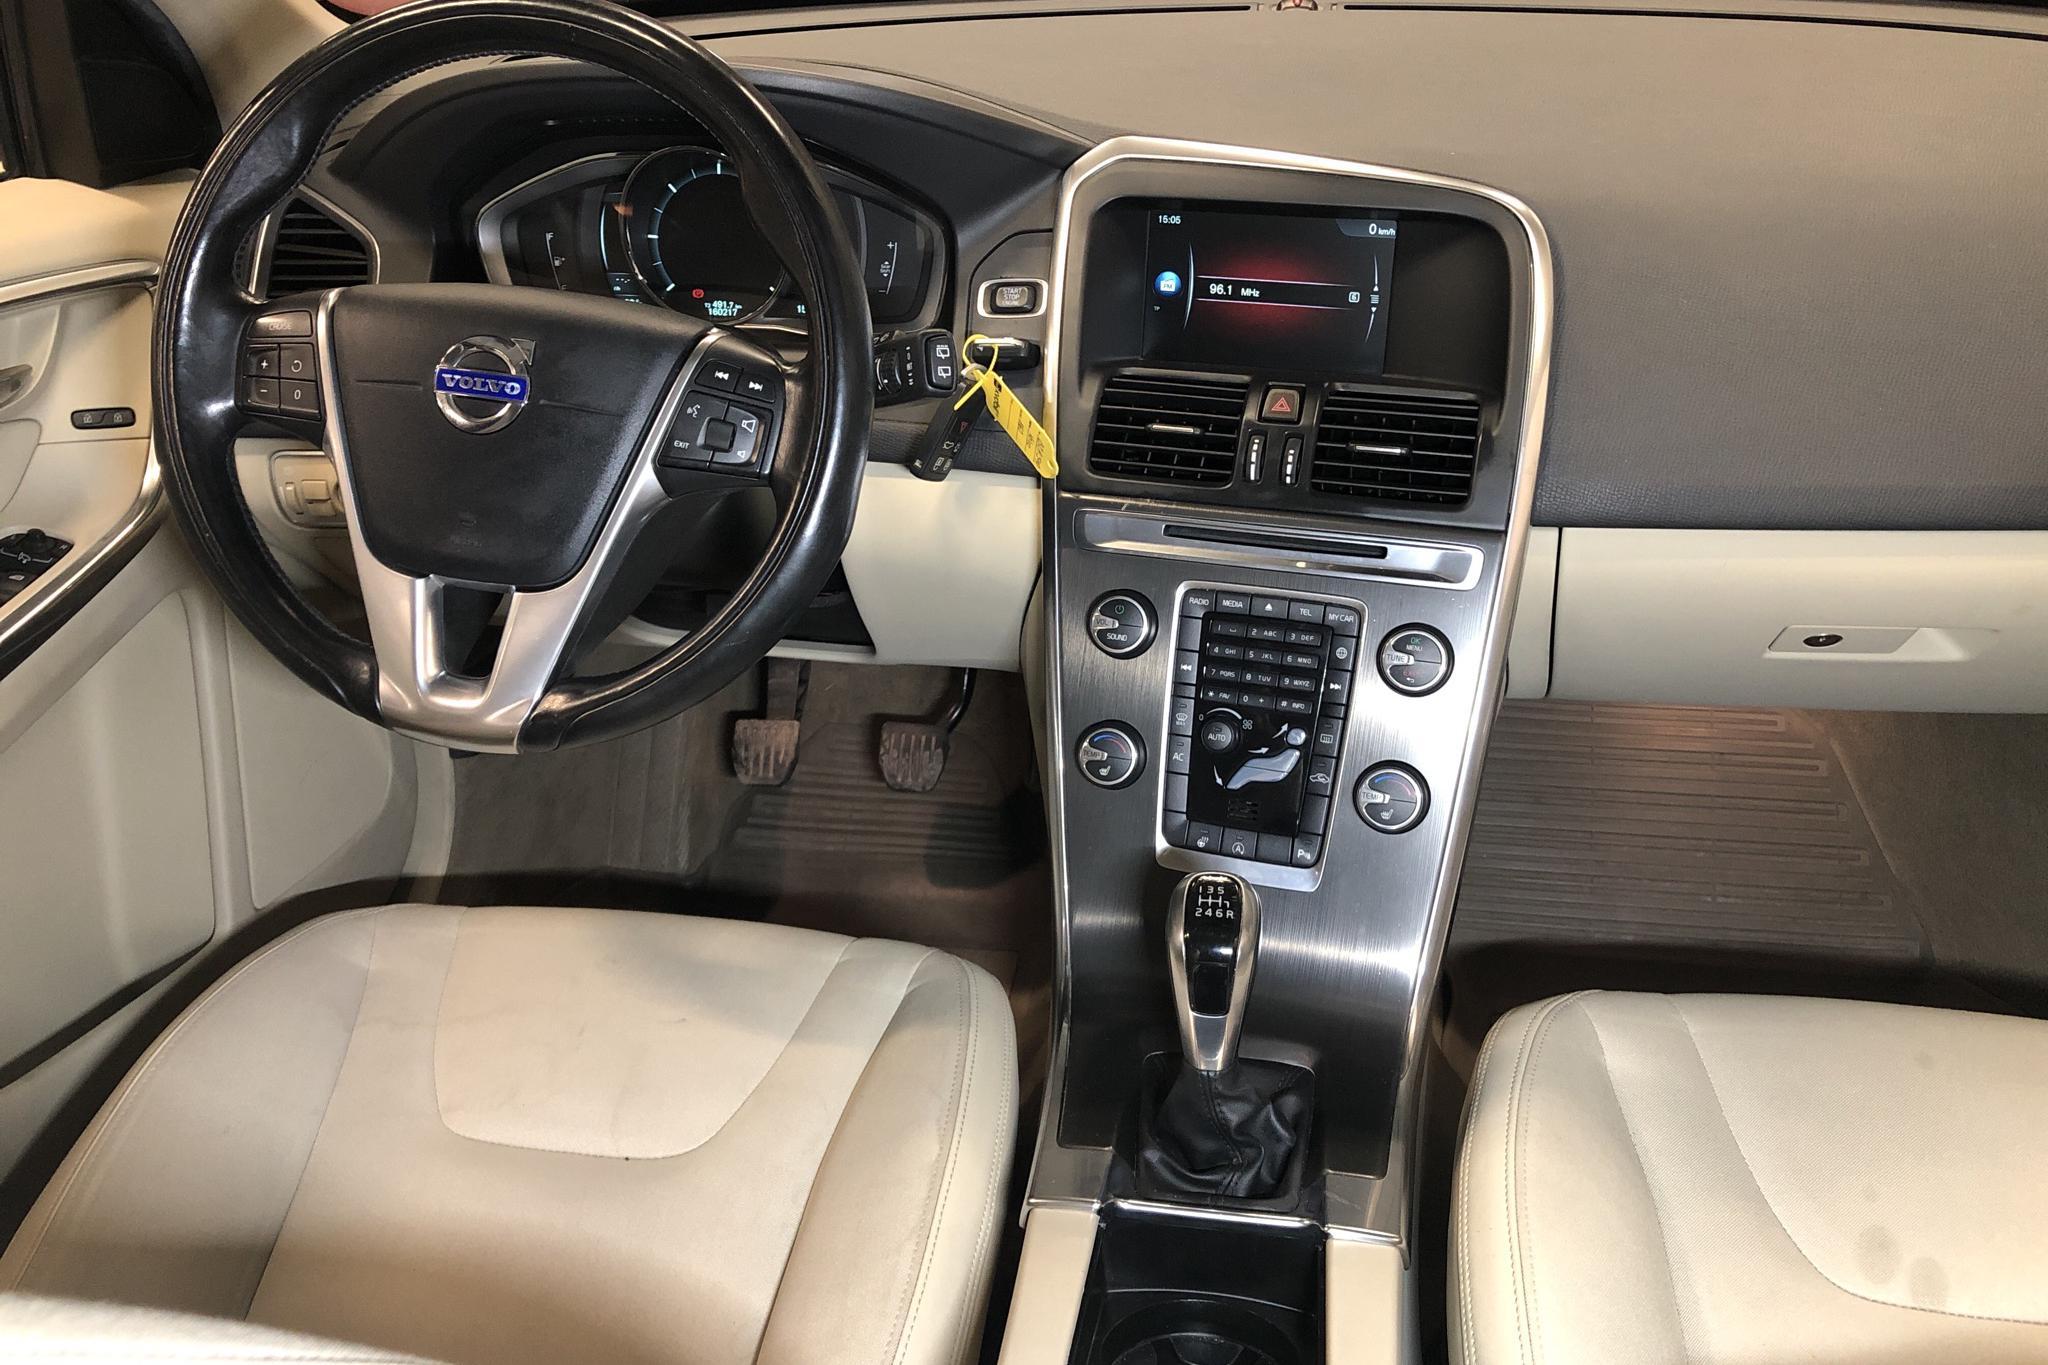 Volvo XC60 D4 2WD (181hk) - 160 210 km - Manual - blue - 2014